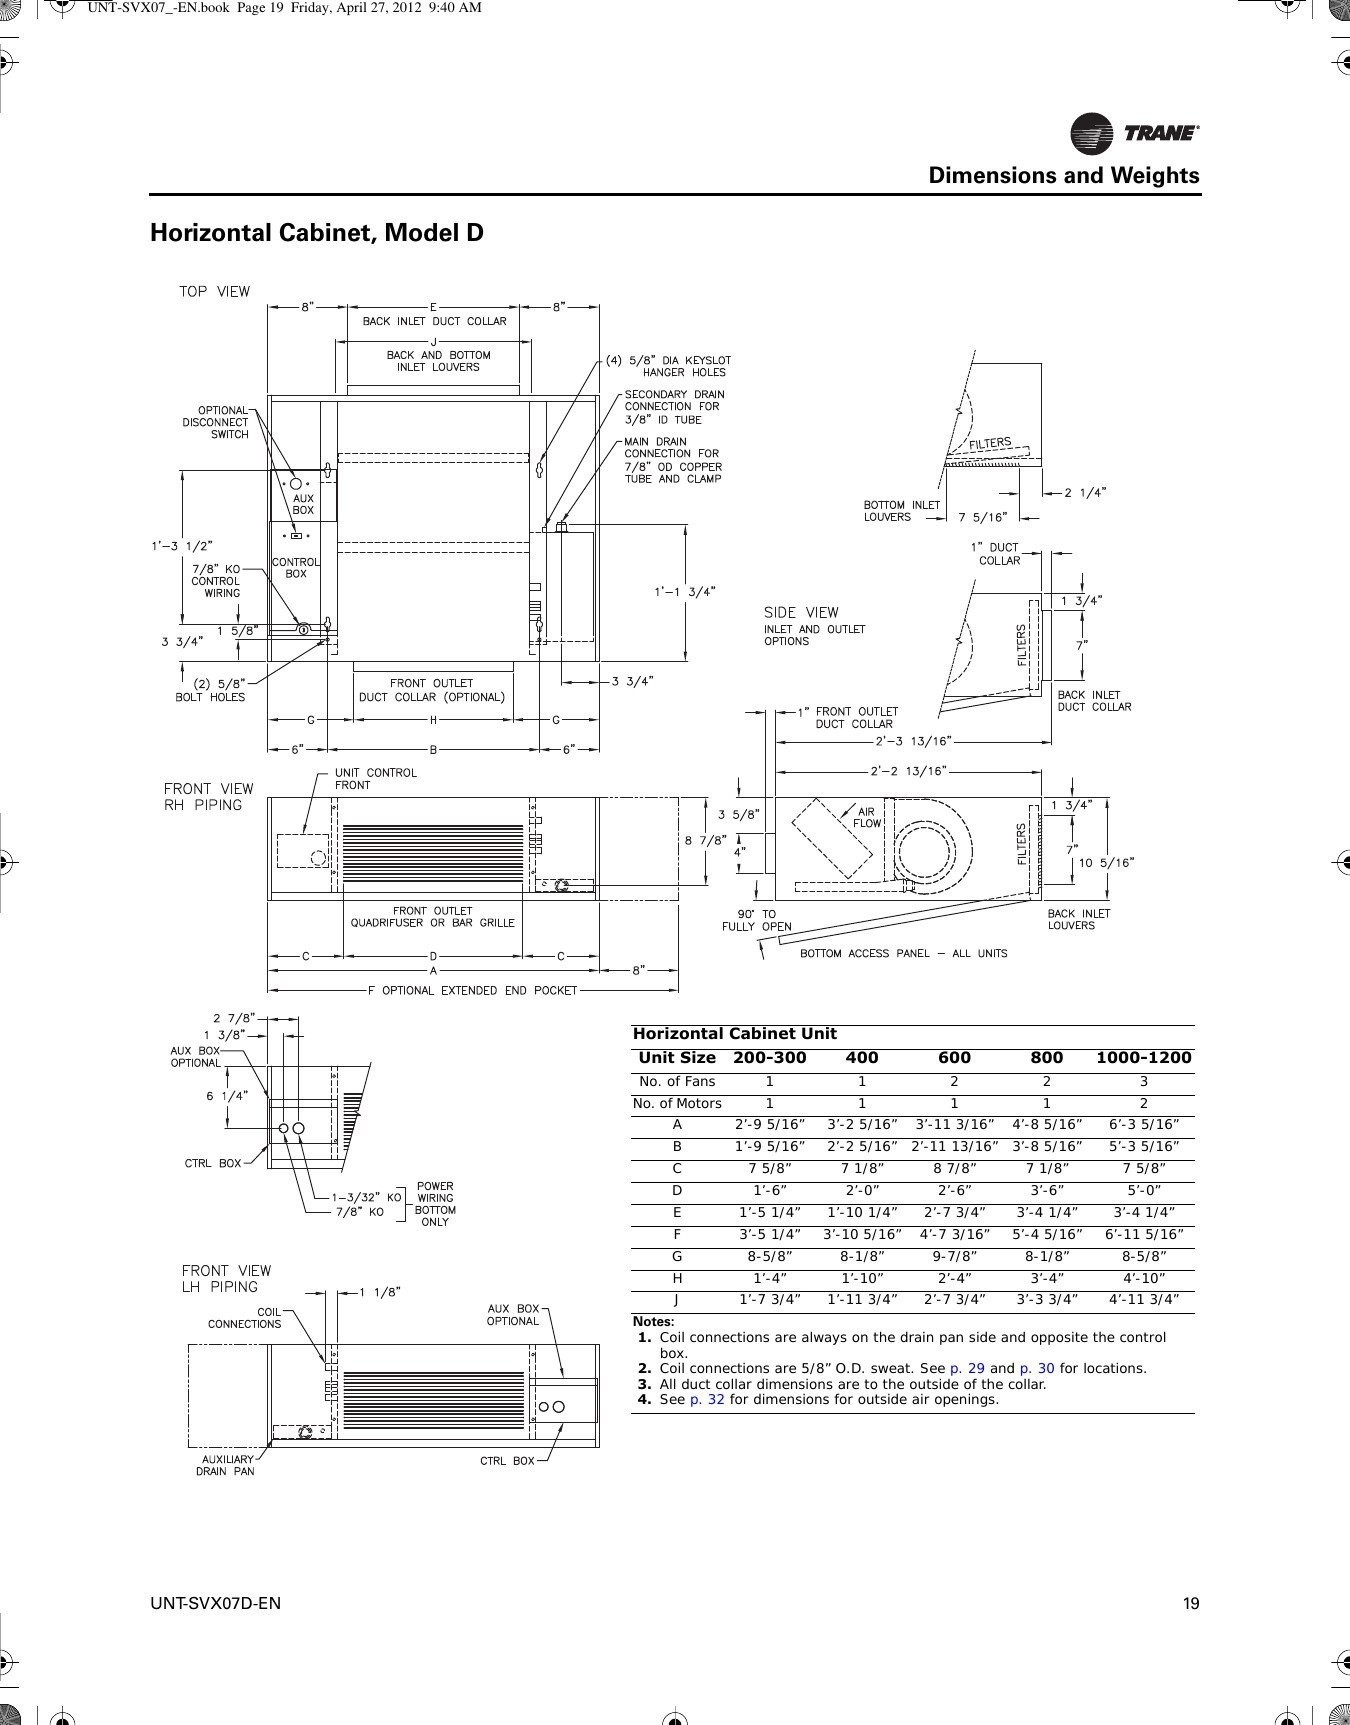 electrolux 2100 parts diagram perfect electrolux wiring diagram image electrical diagram ideas